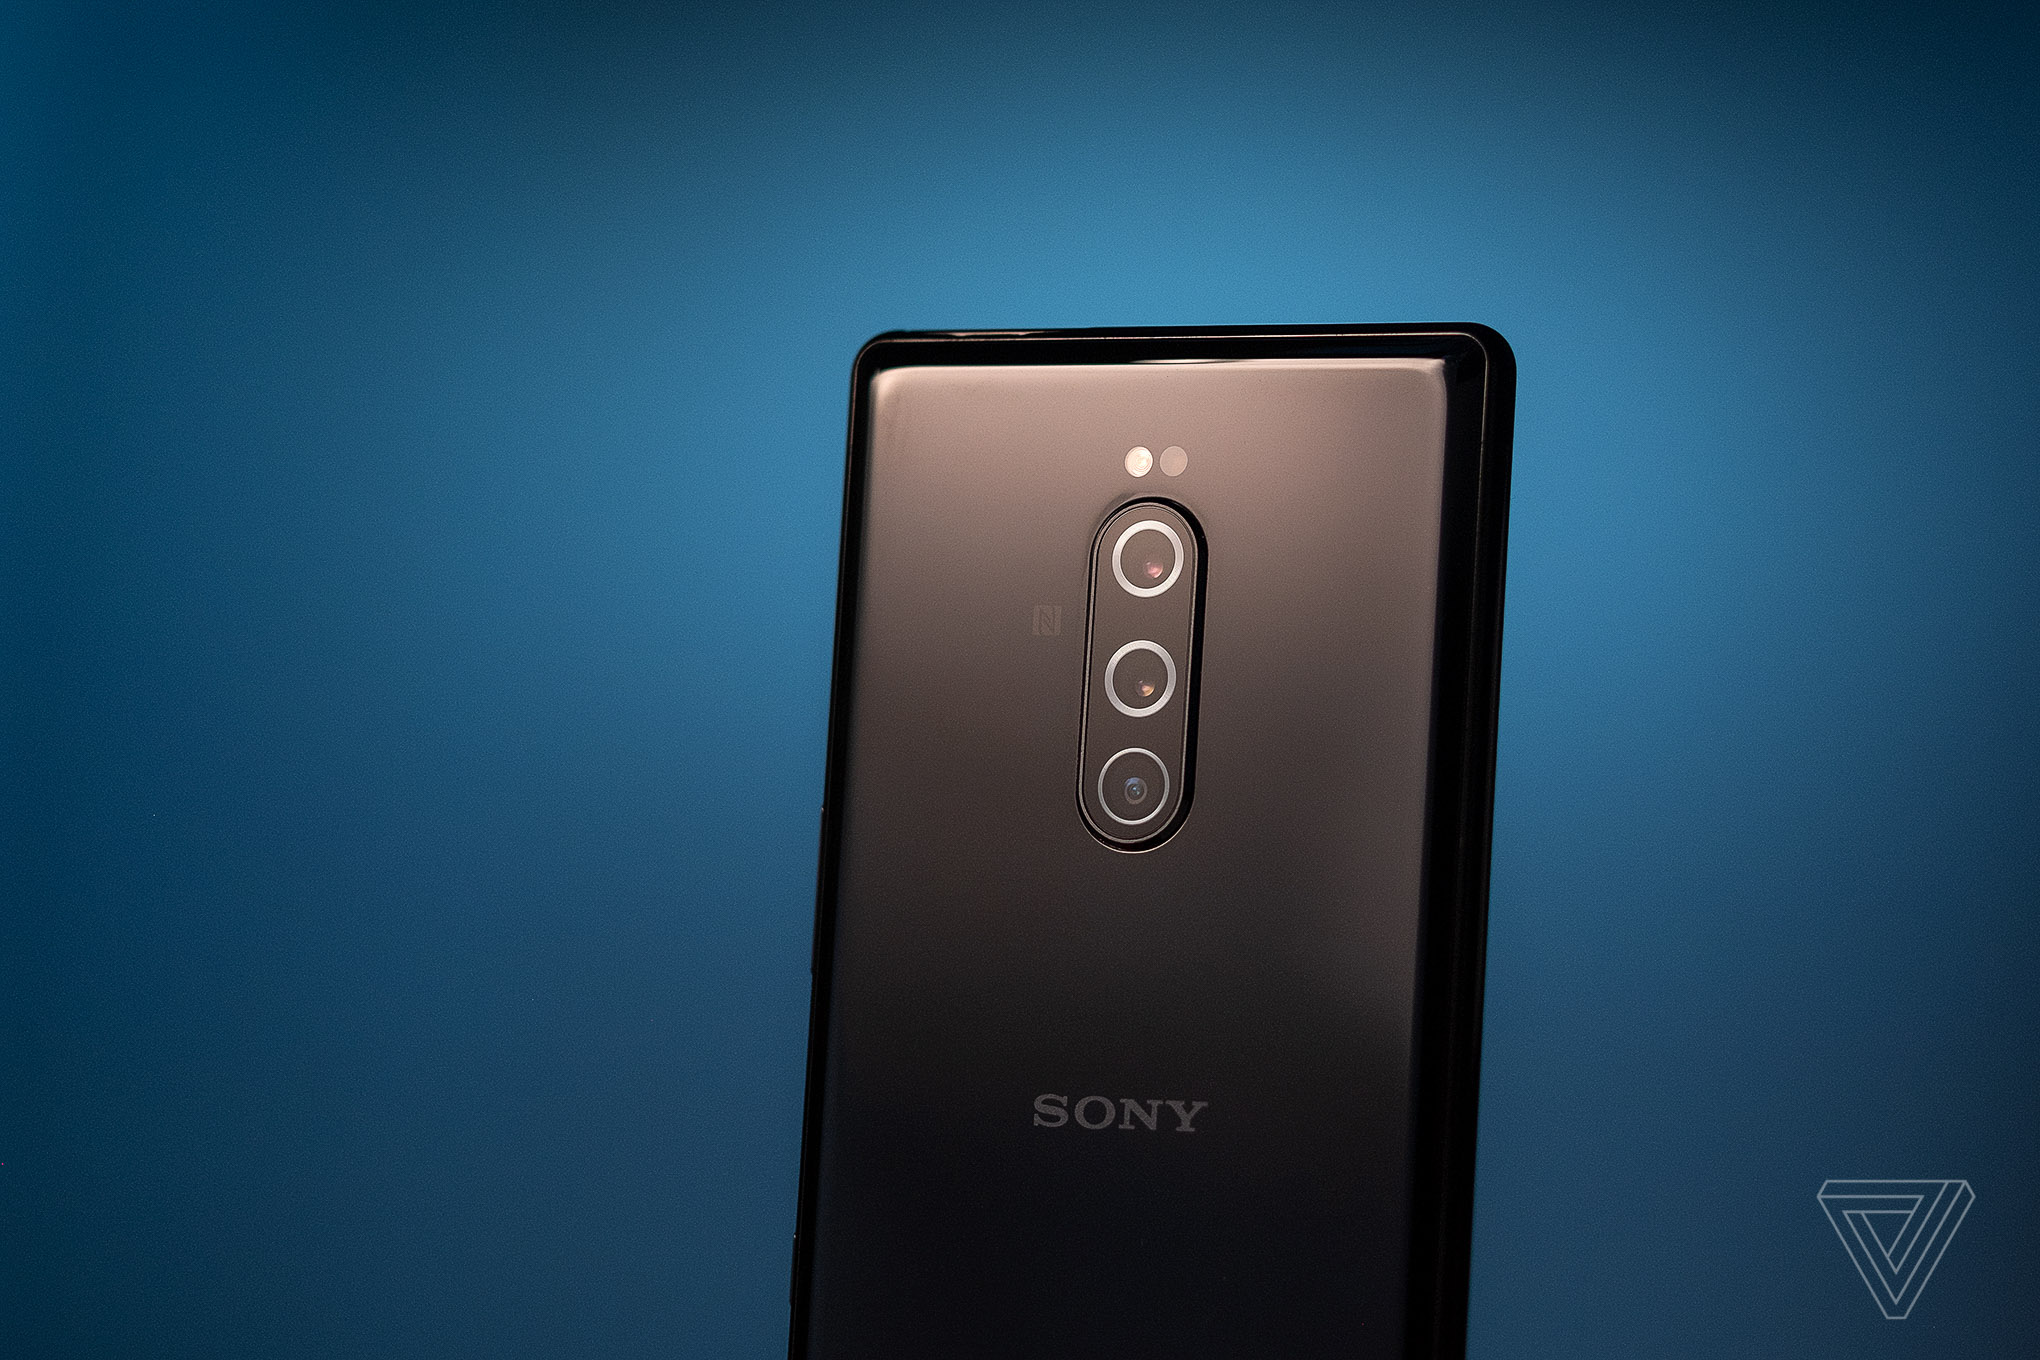 Intel присоединяется к отказу Sony и Amazon от участия в Mobile World Congress из-за риска коронавируса